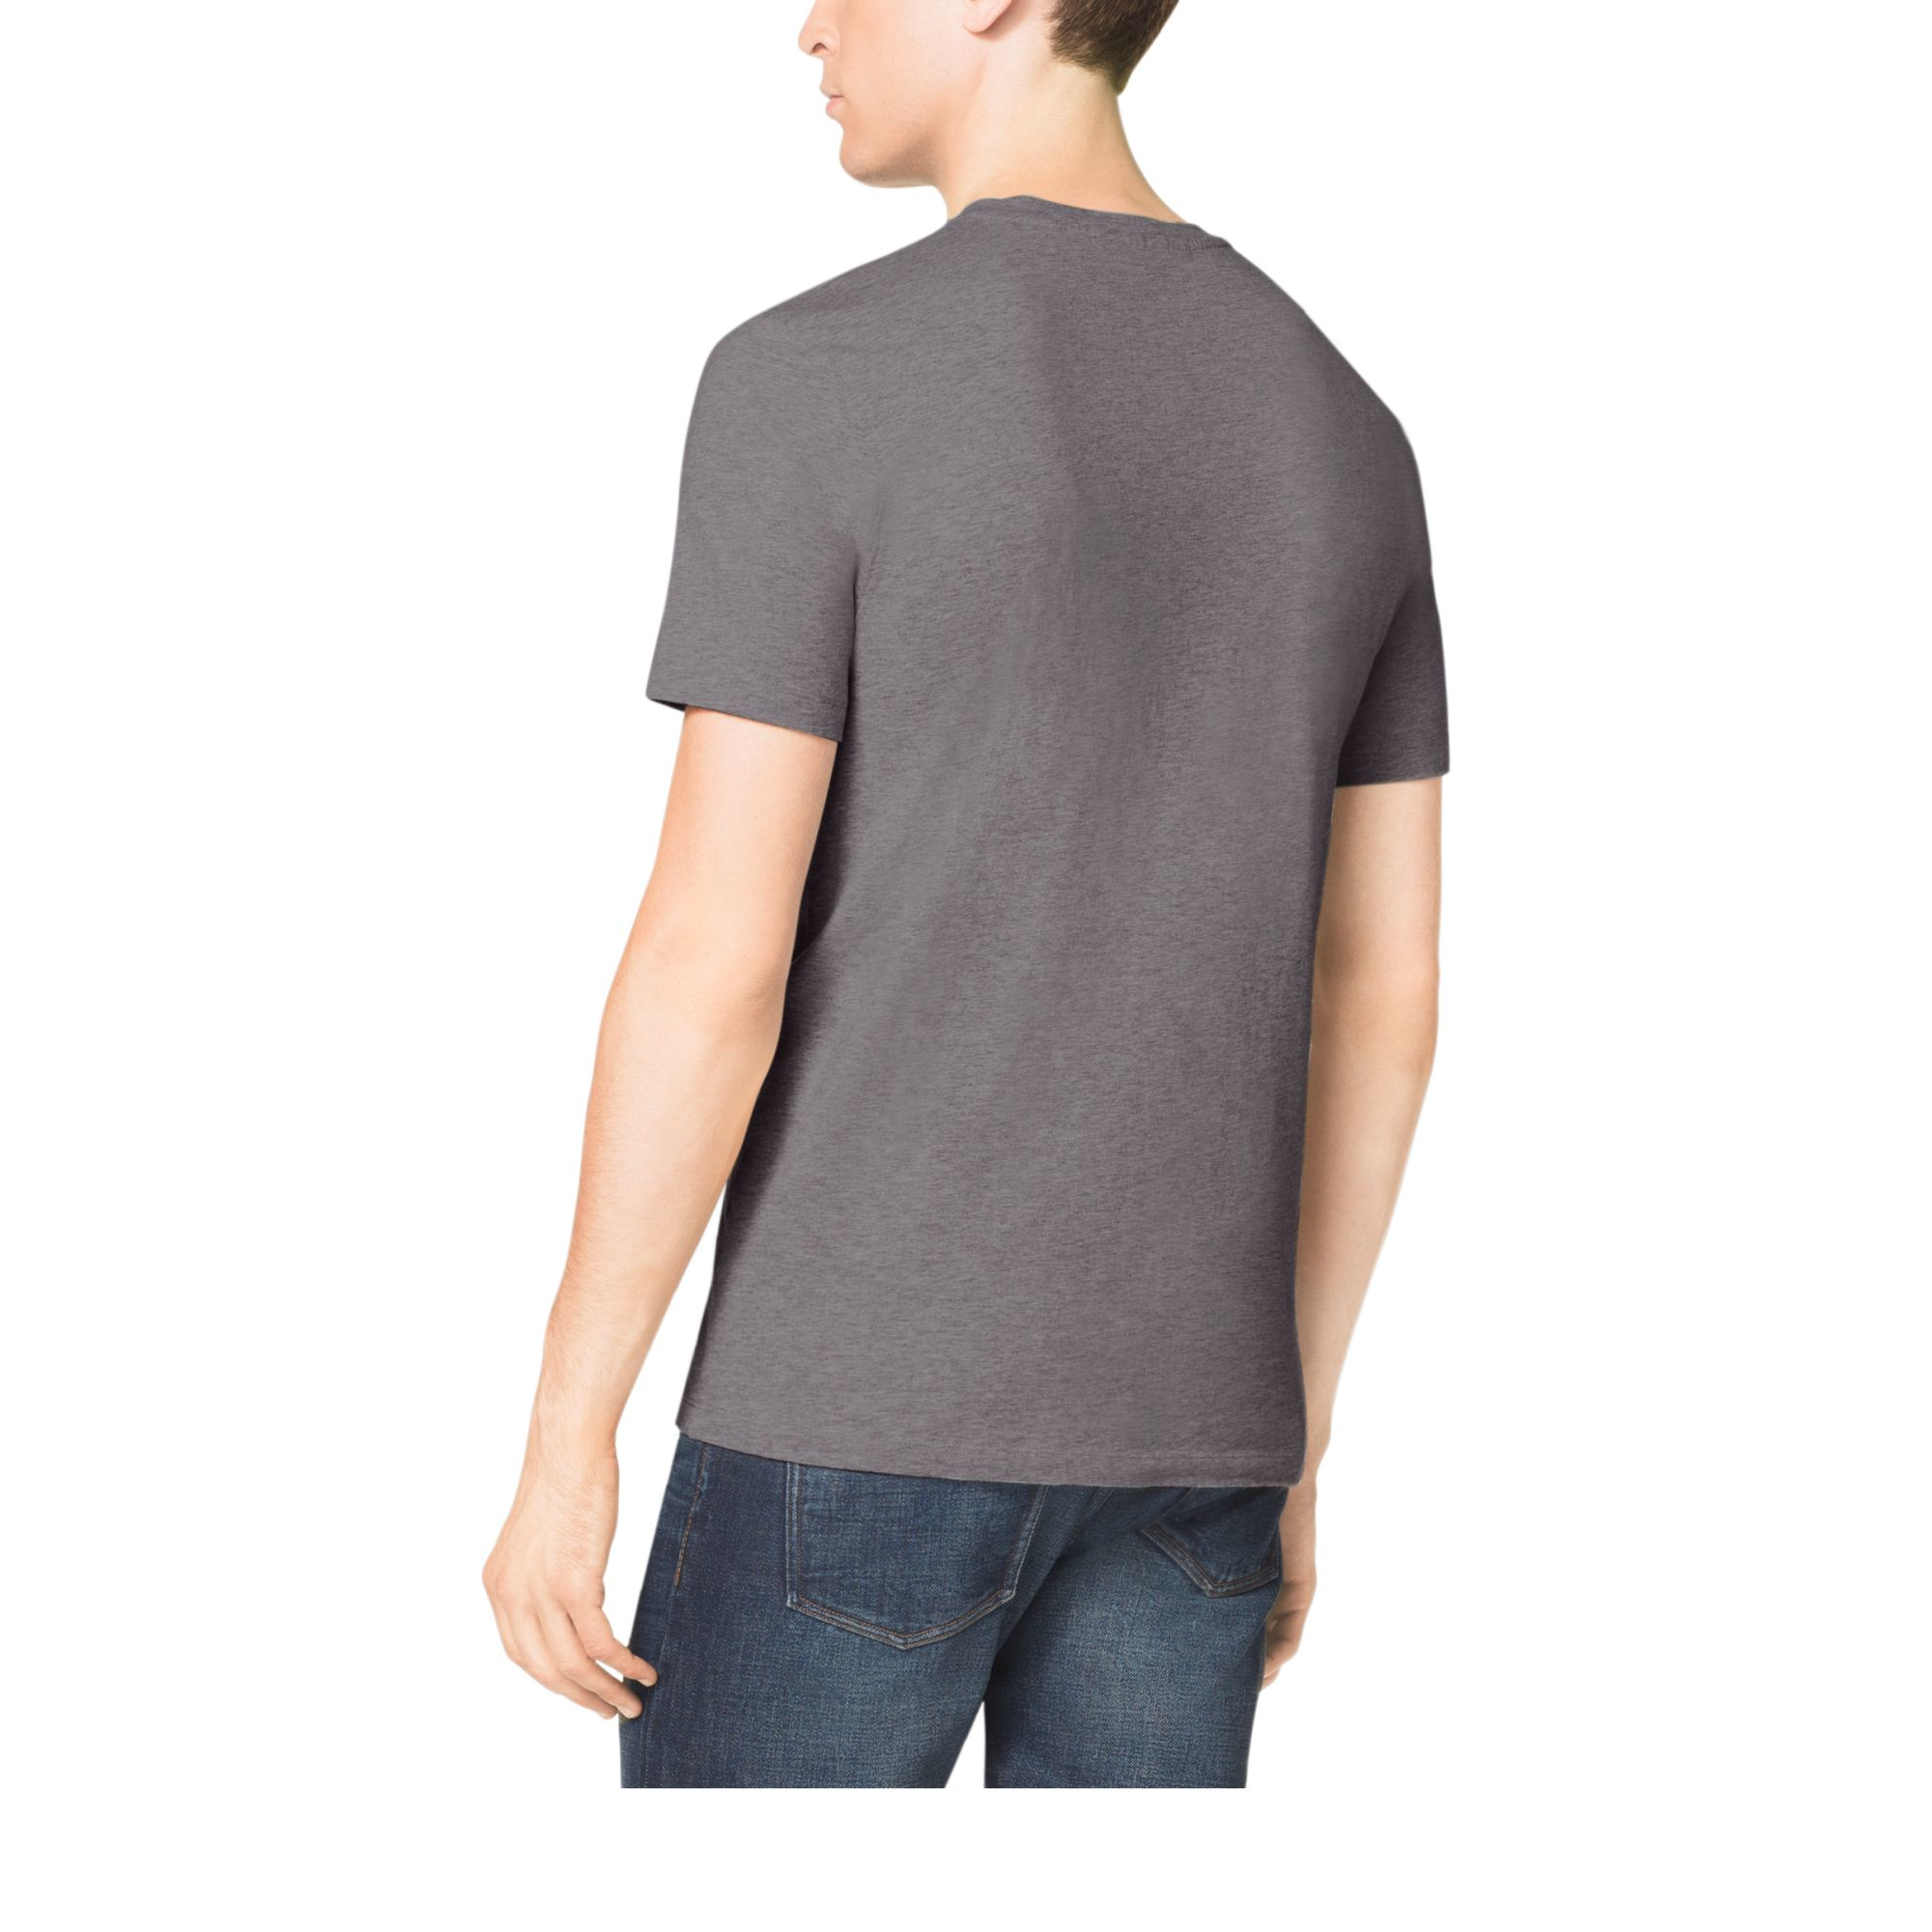 michael kors v neck cotton t shirt in gray for men lyst. Black Bedroom Furniture Sets. Home Design Ideas